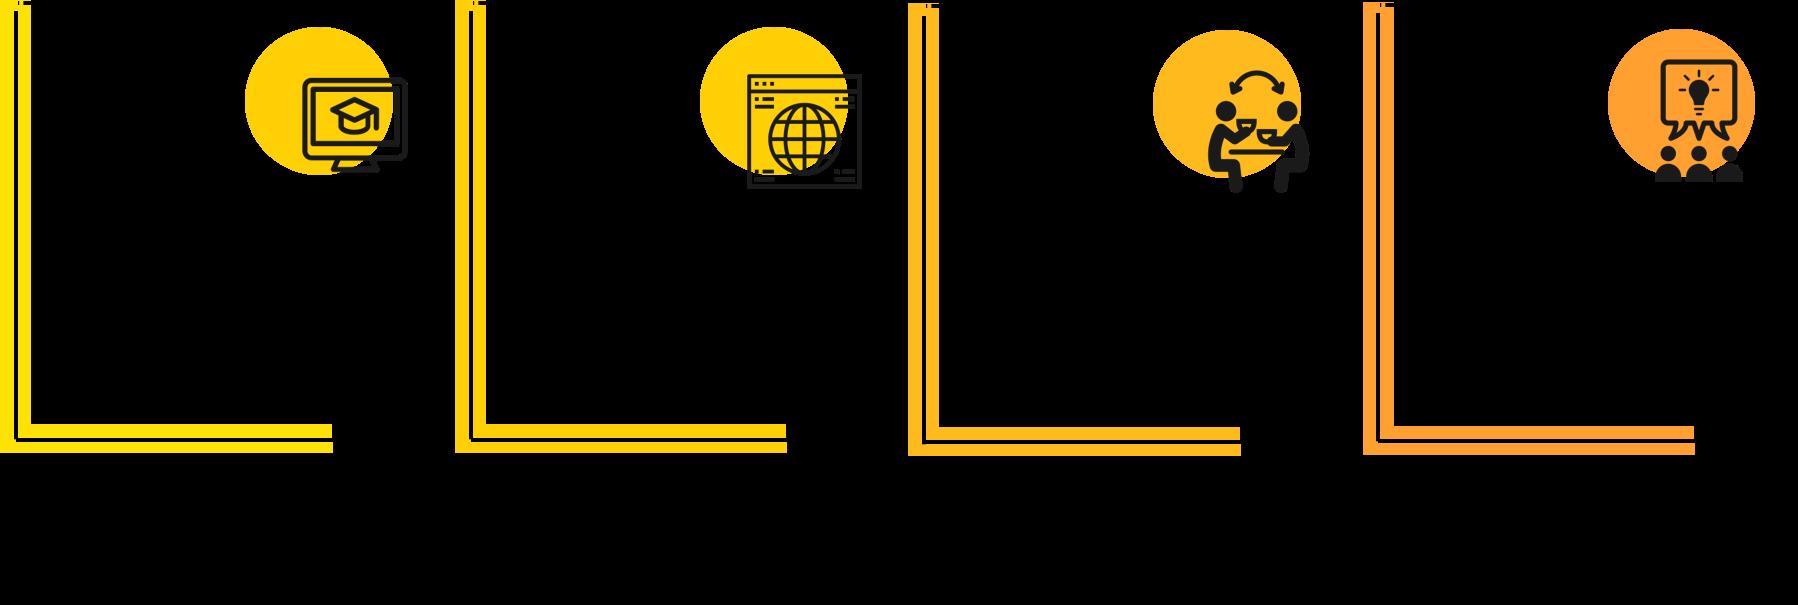 Evolution-Corporate-eLearning